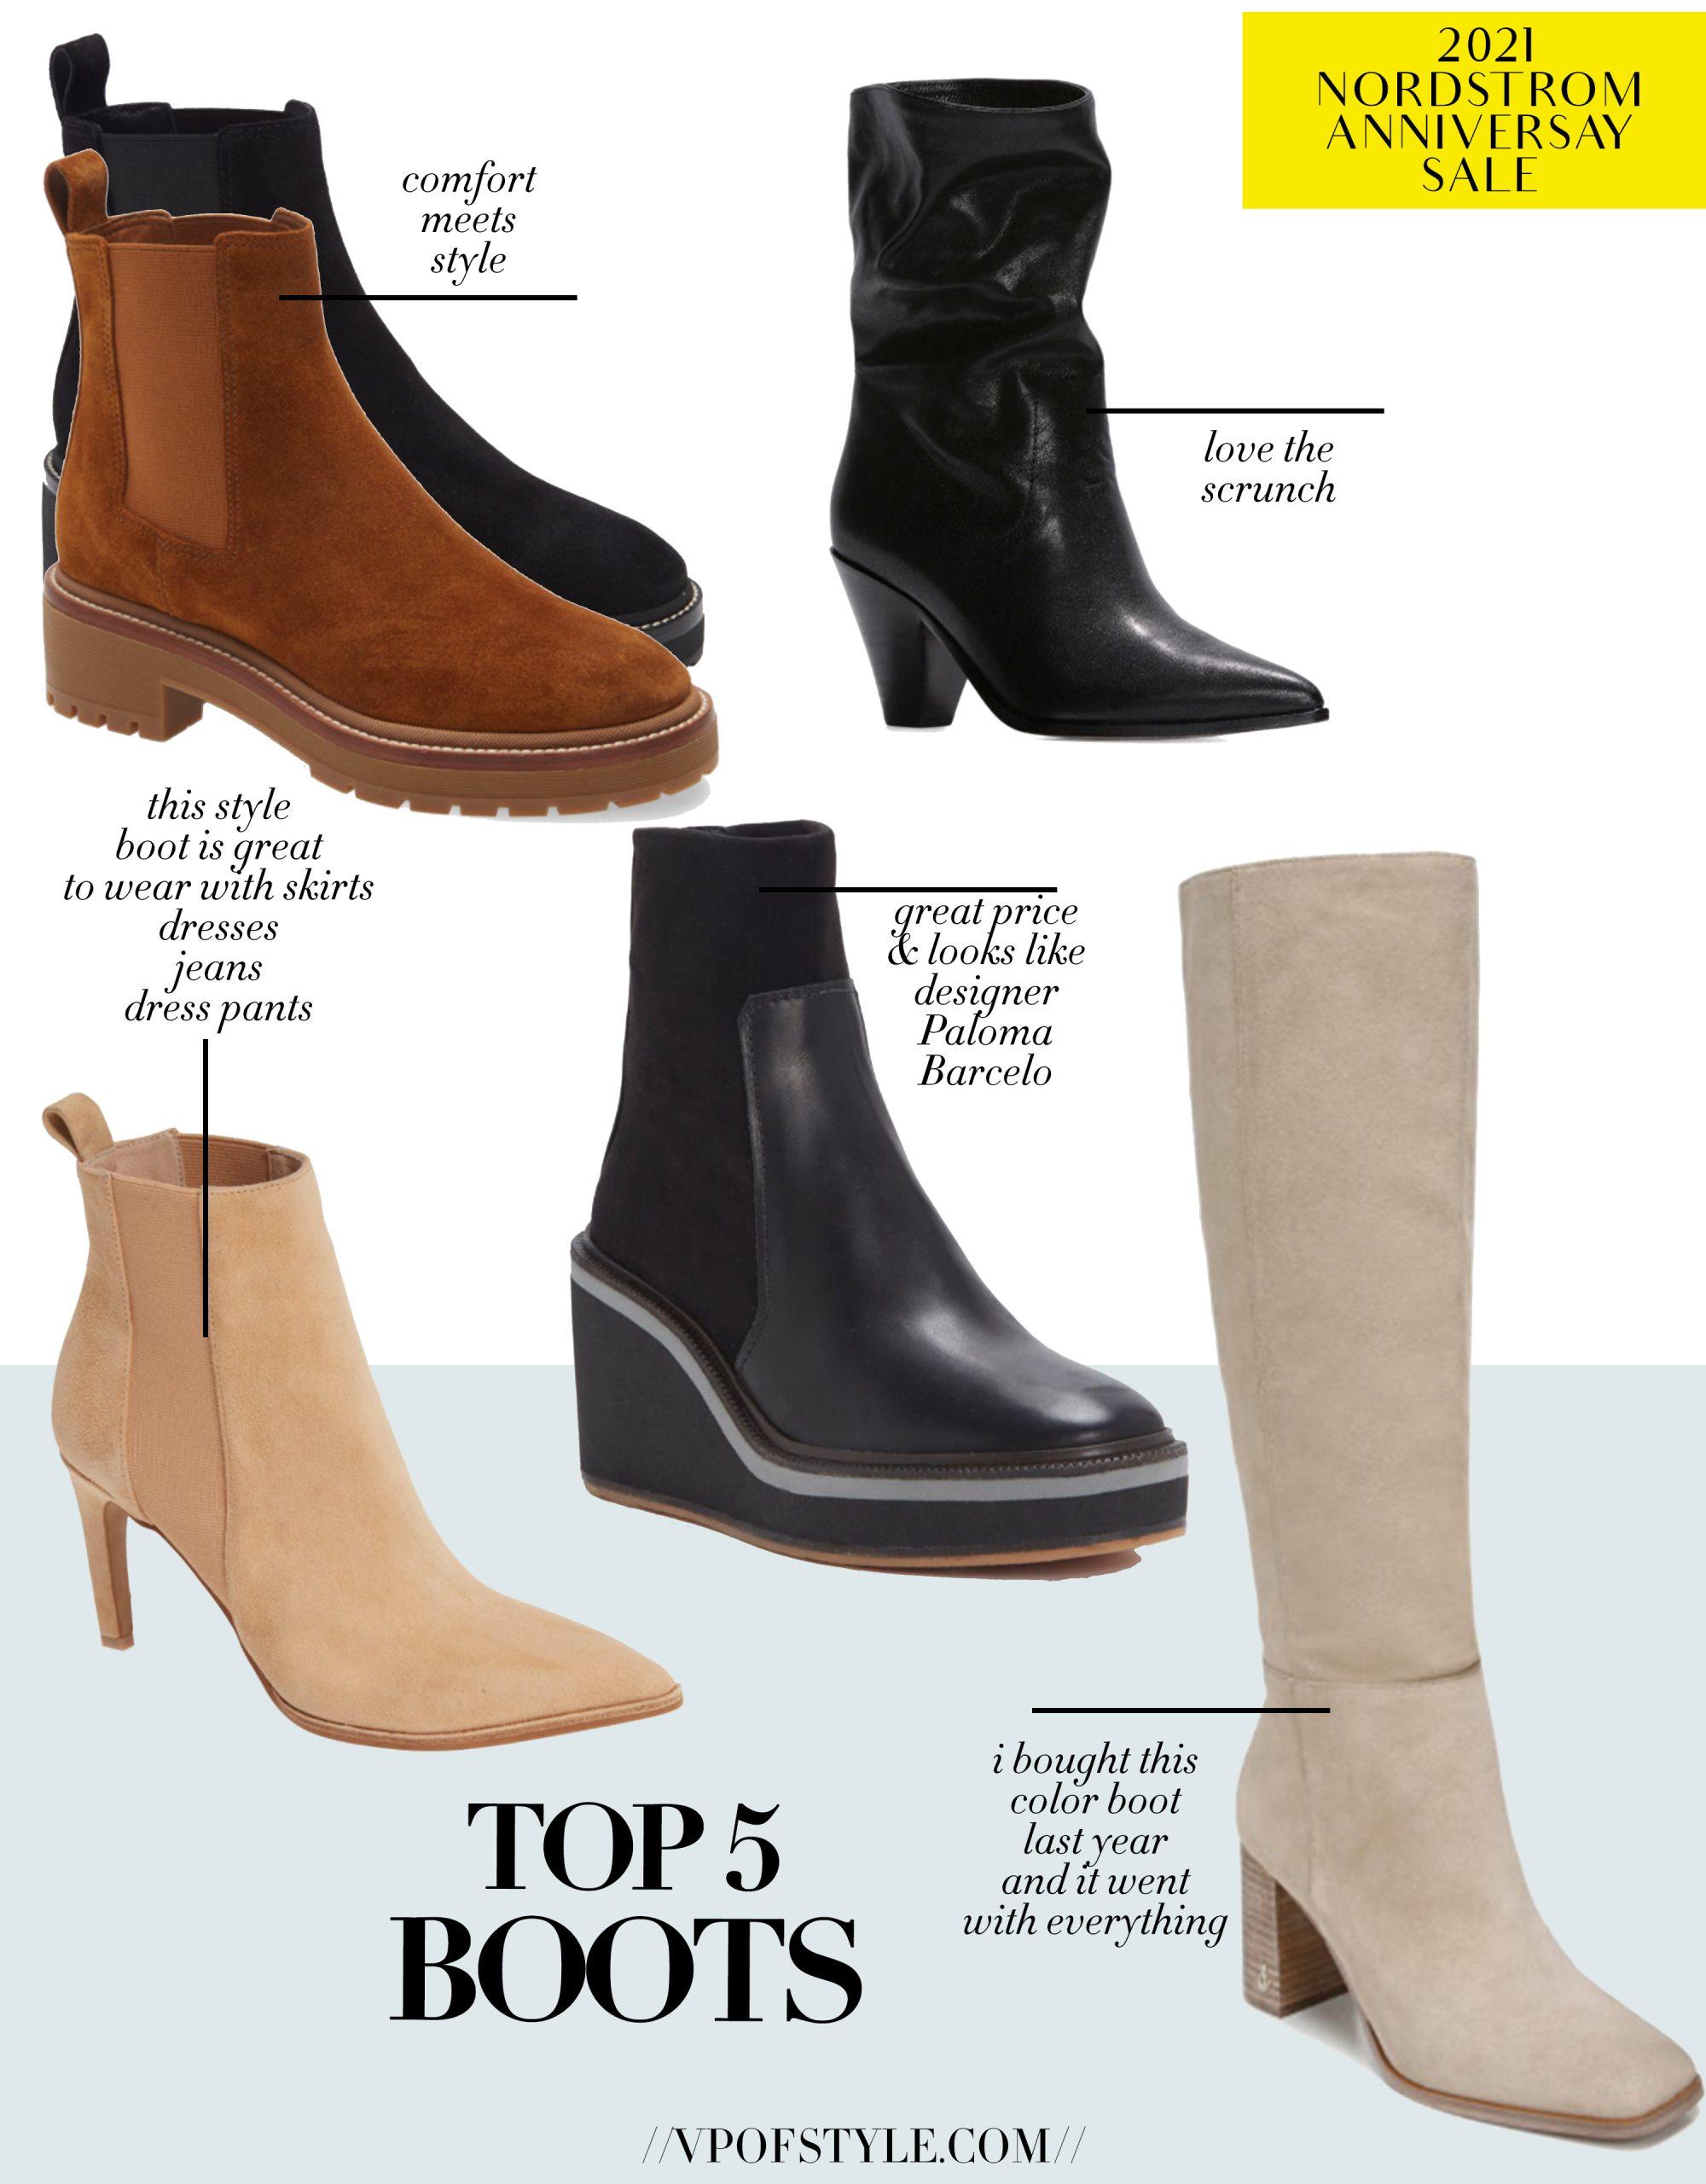 top 5 boot picks Nordstrom Anniversary Sale